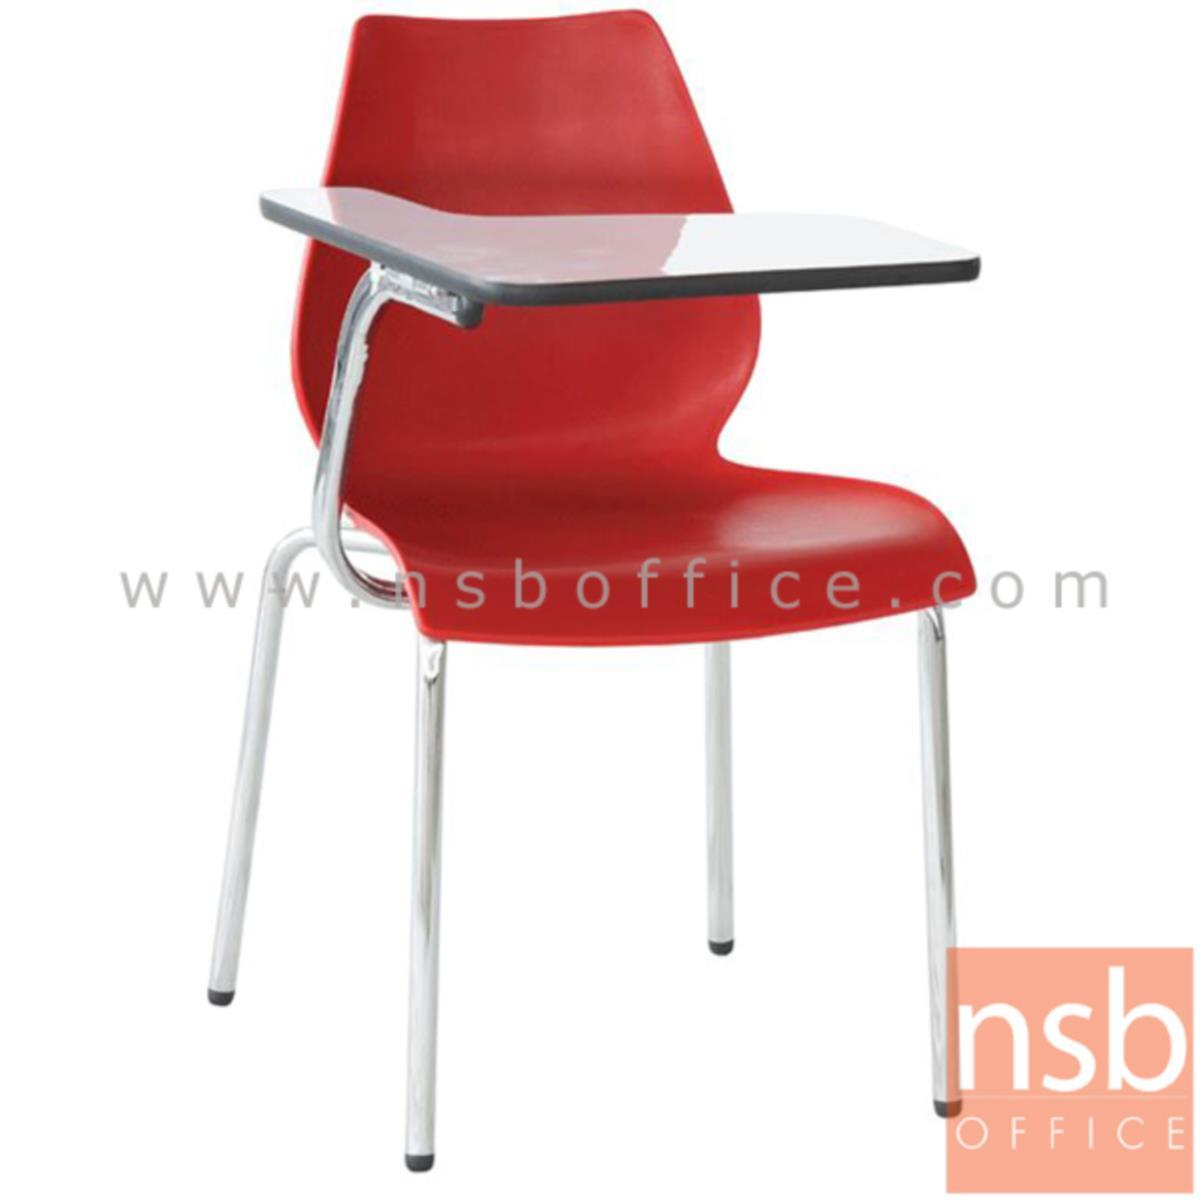 B07A062:เก้าอี้เลคเชอร์เฟรมโพลี่ รุ่น B208  ขาเหล็กชุบโครเมี่ยม